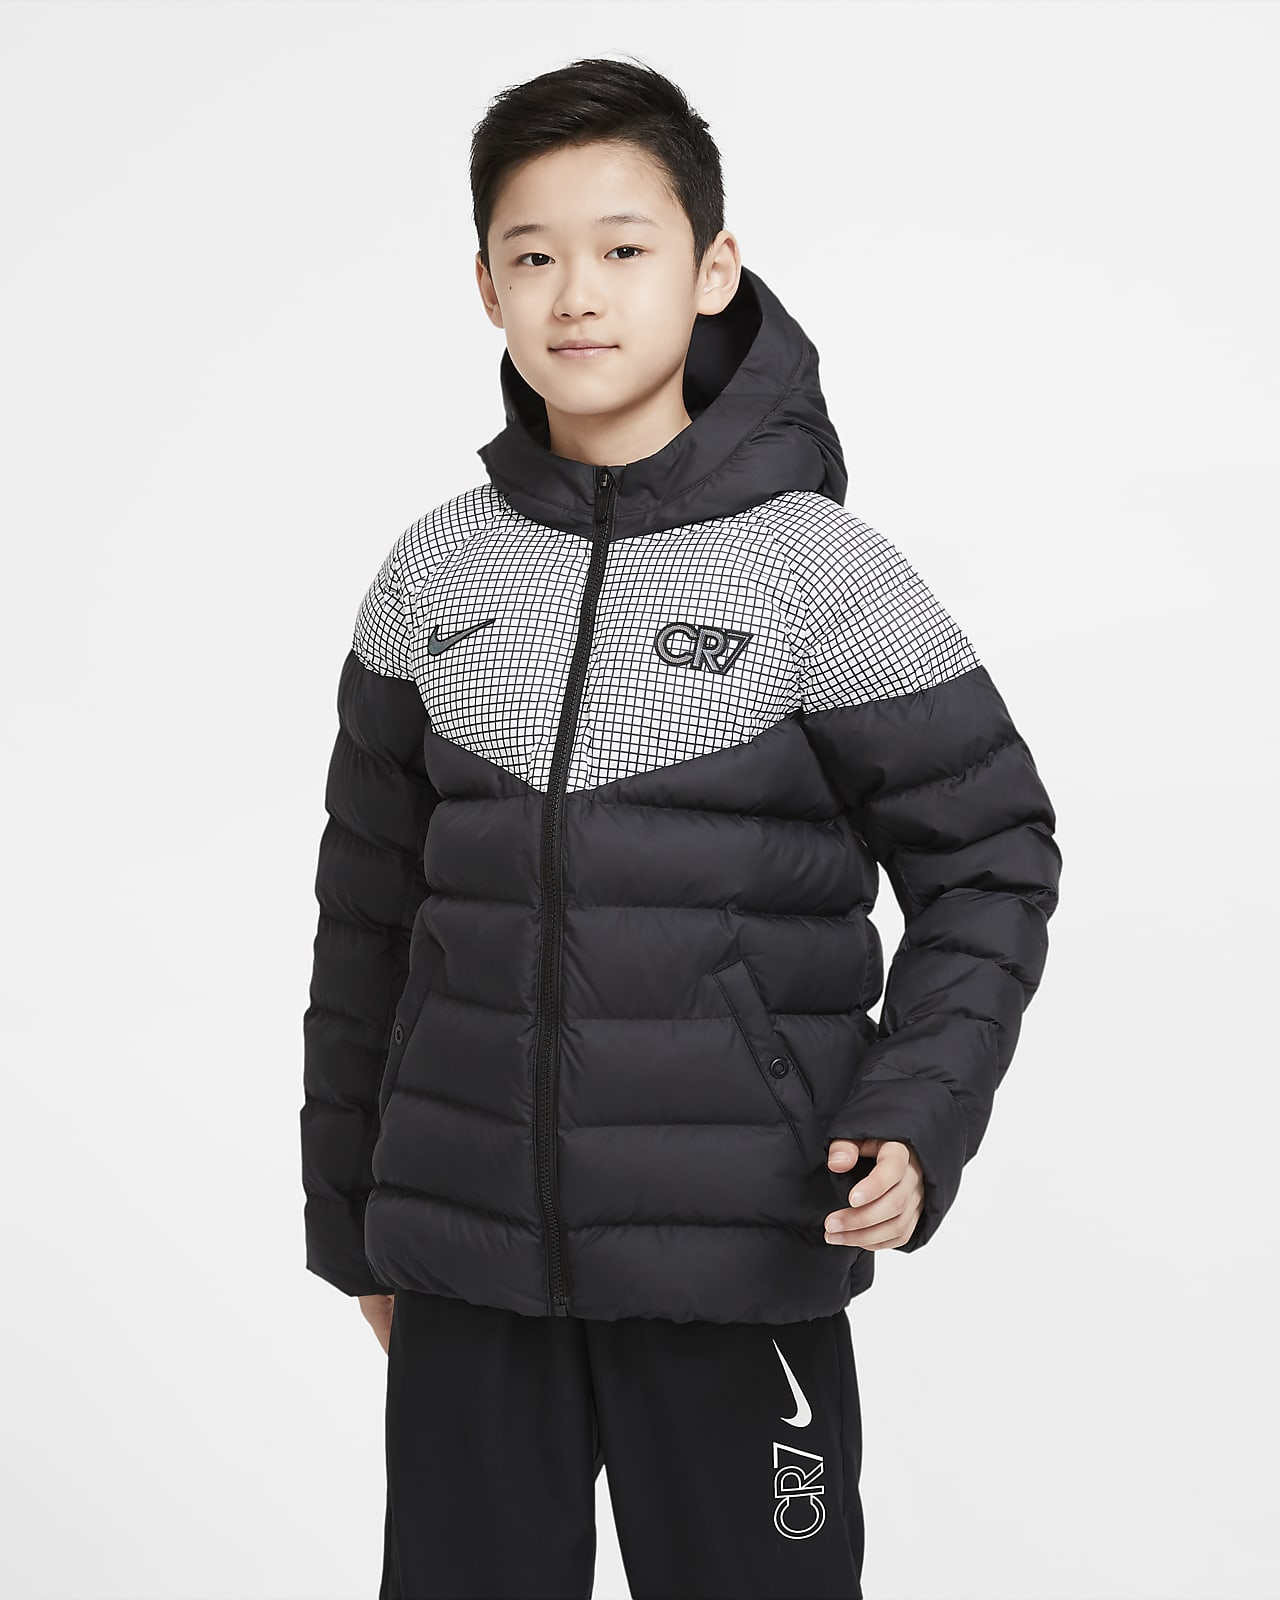 CR7 Older Kids' Padded Football Jacket